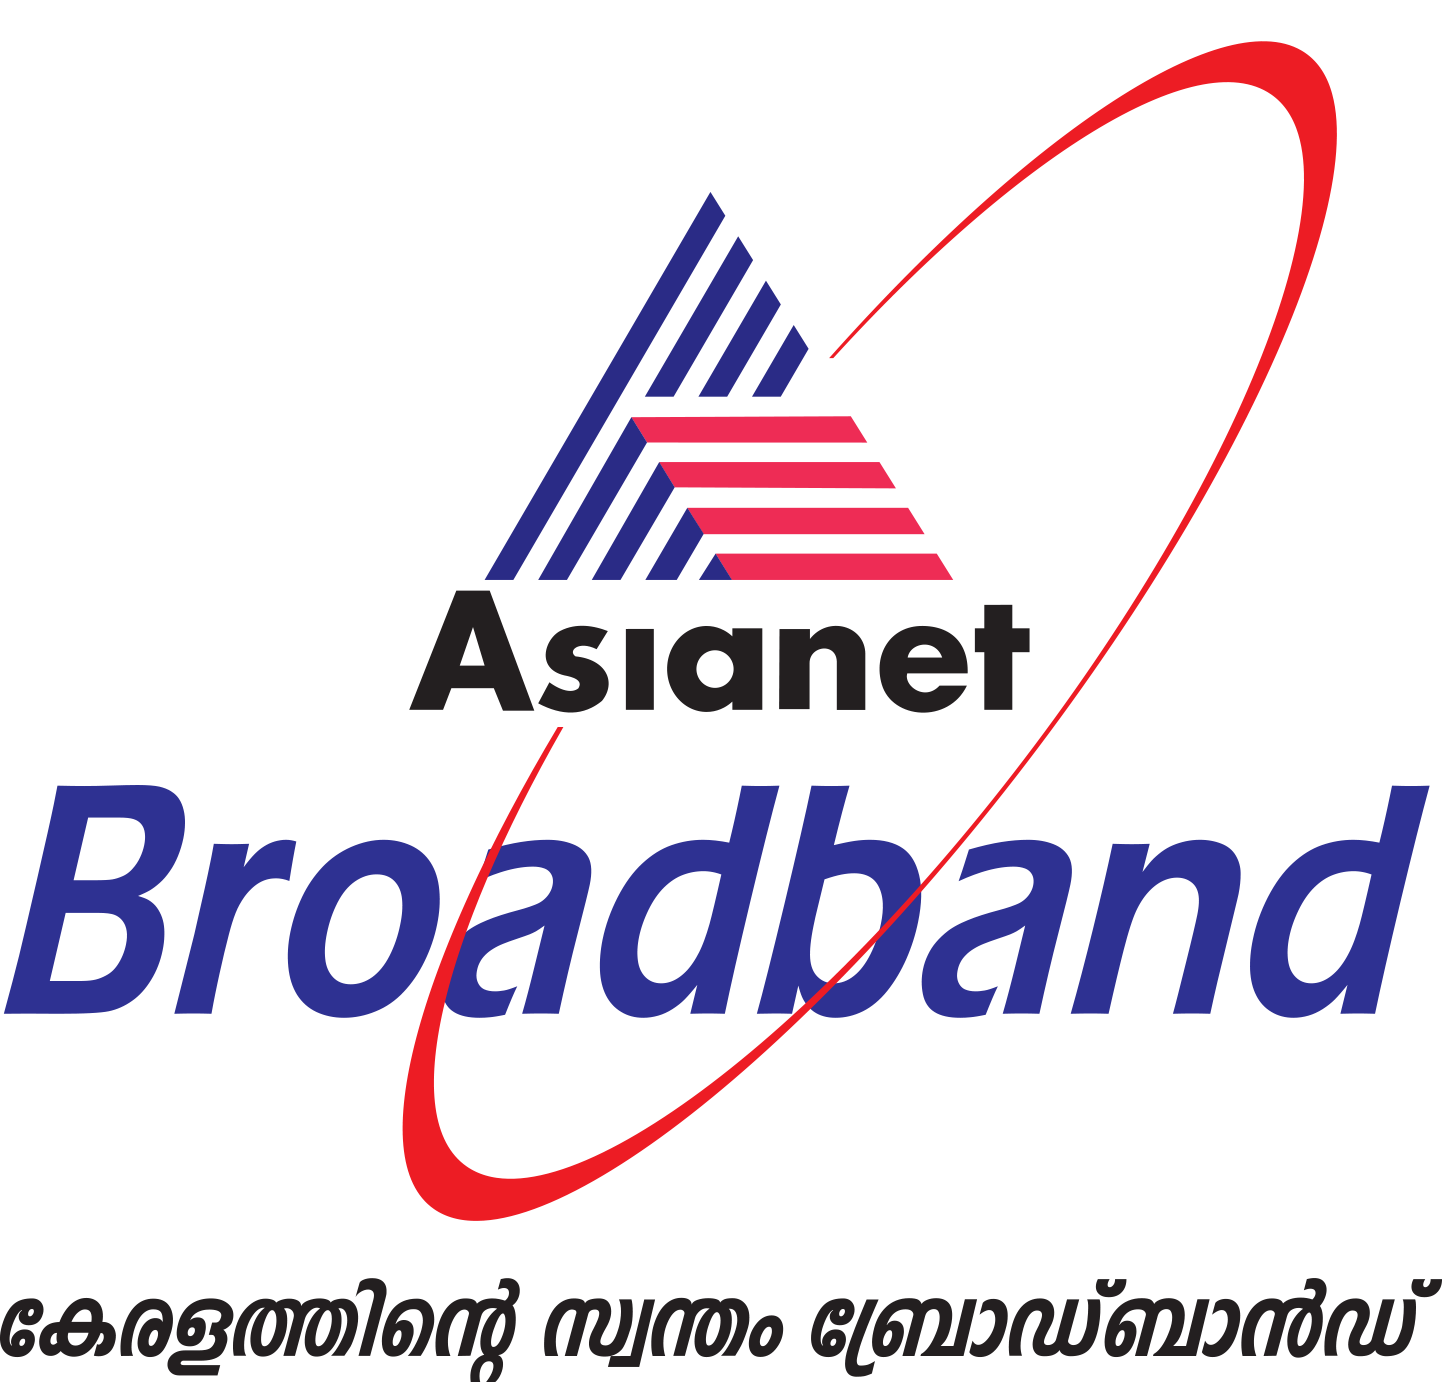 Asianet Broadband Image